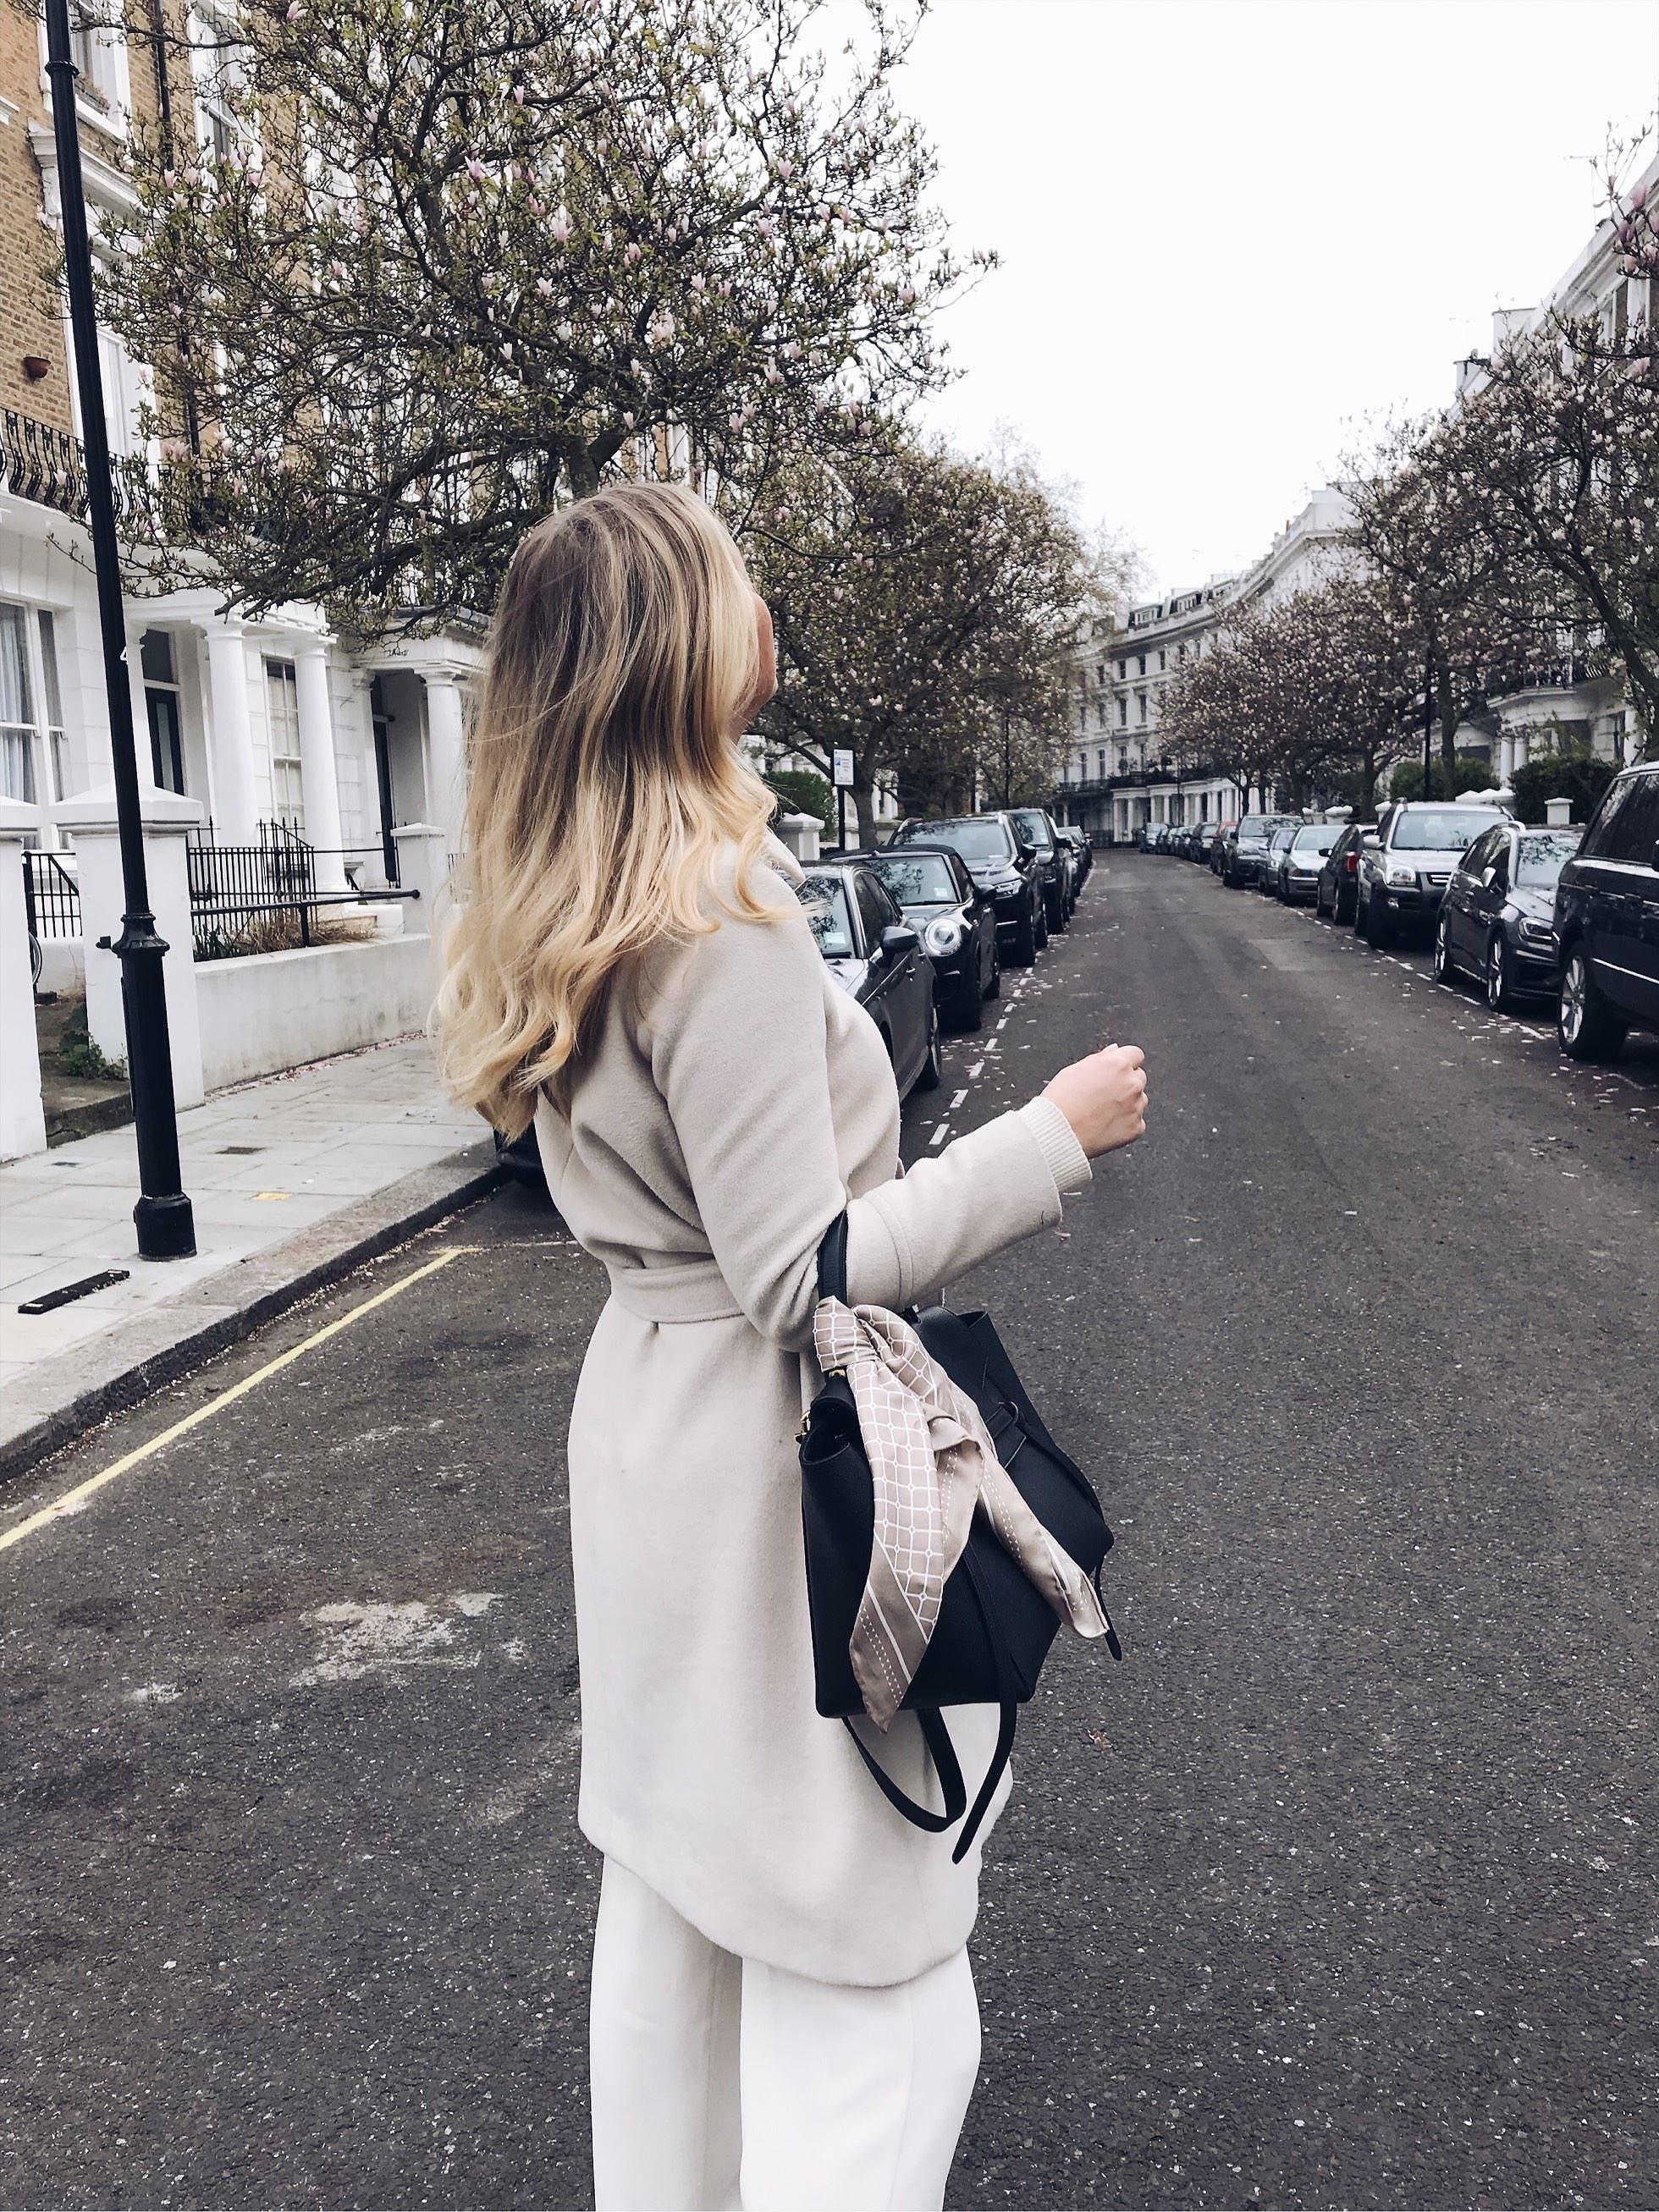 En dag i Notting Hill